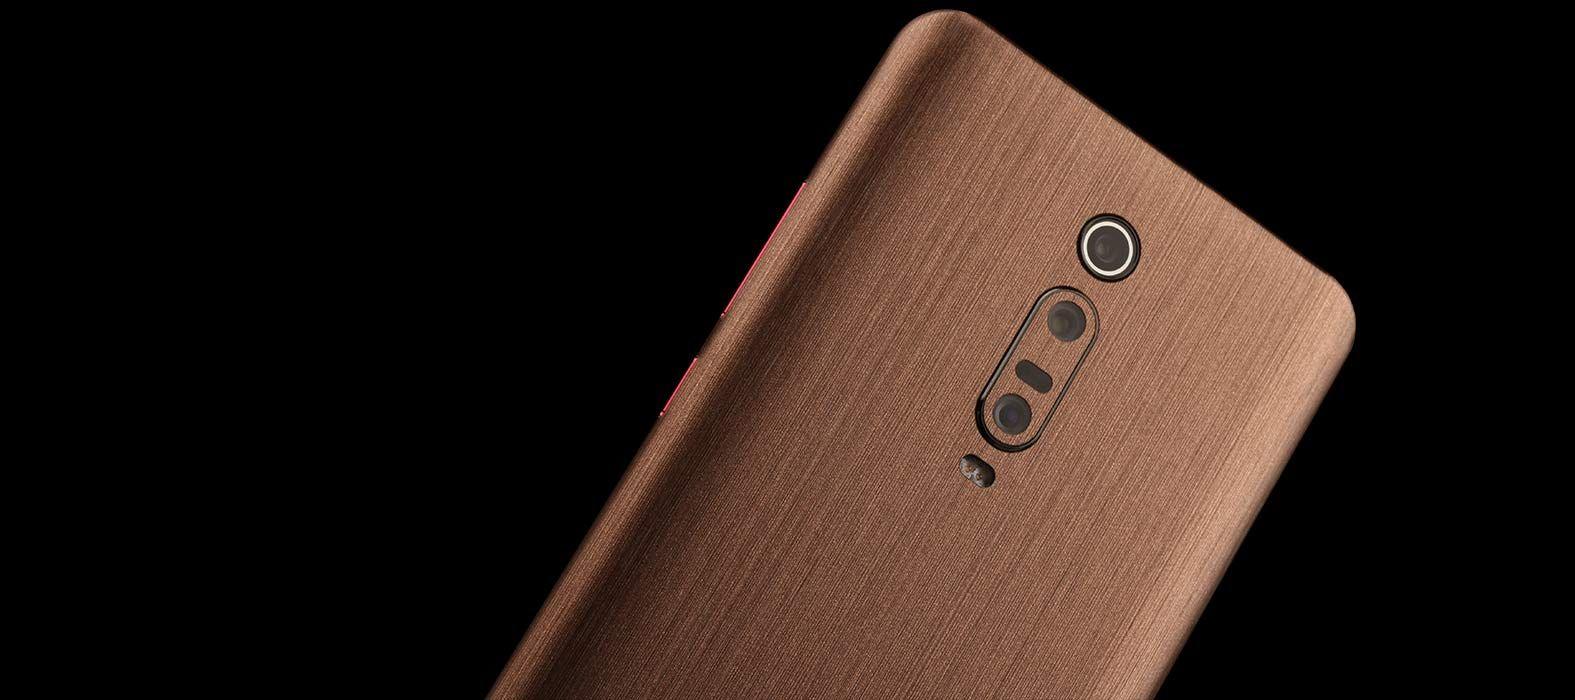 Redmi-K20-Pro-Brushed-Copper-Skins